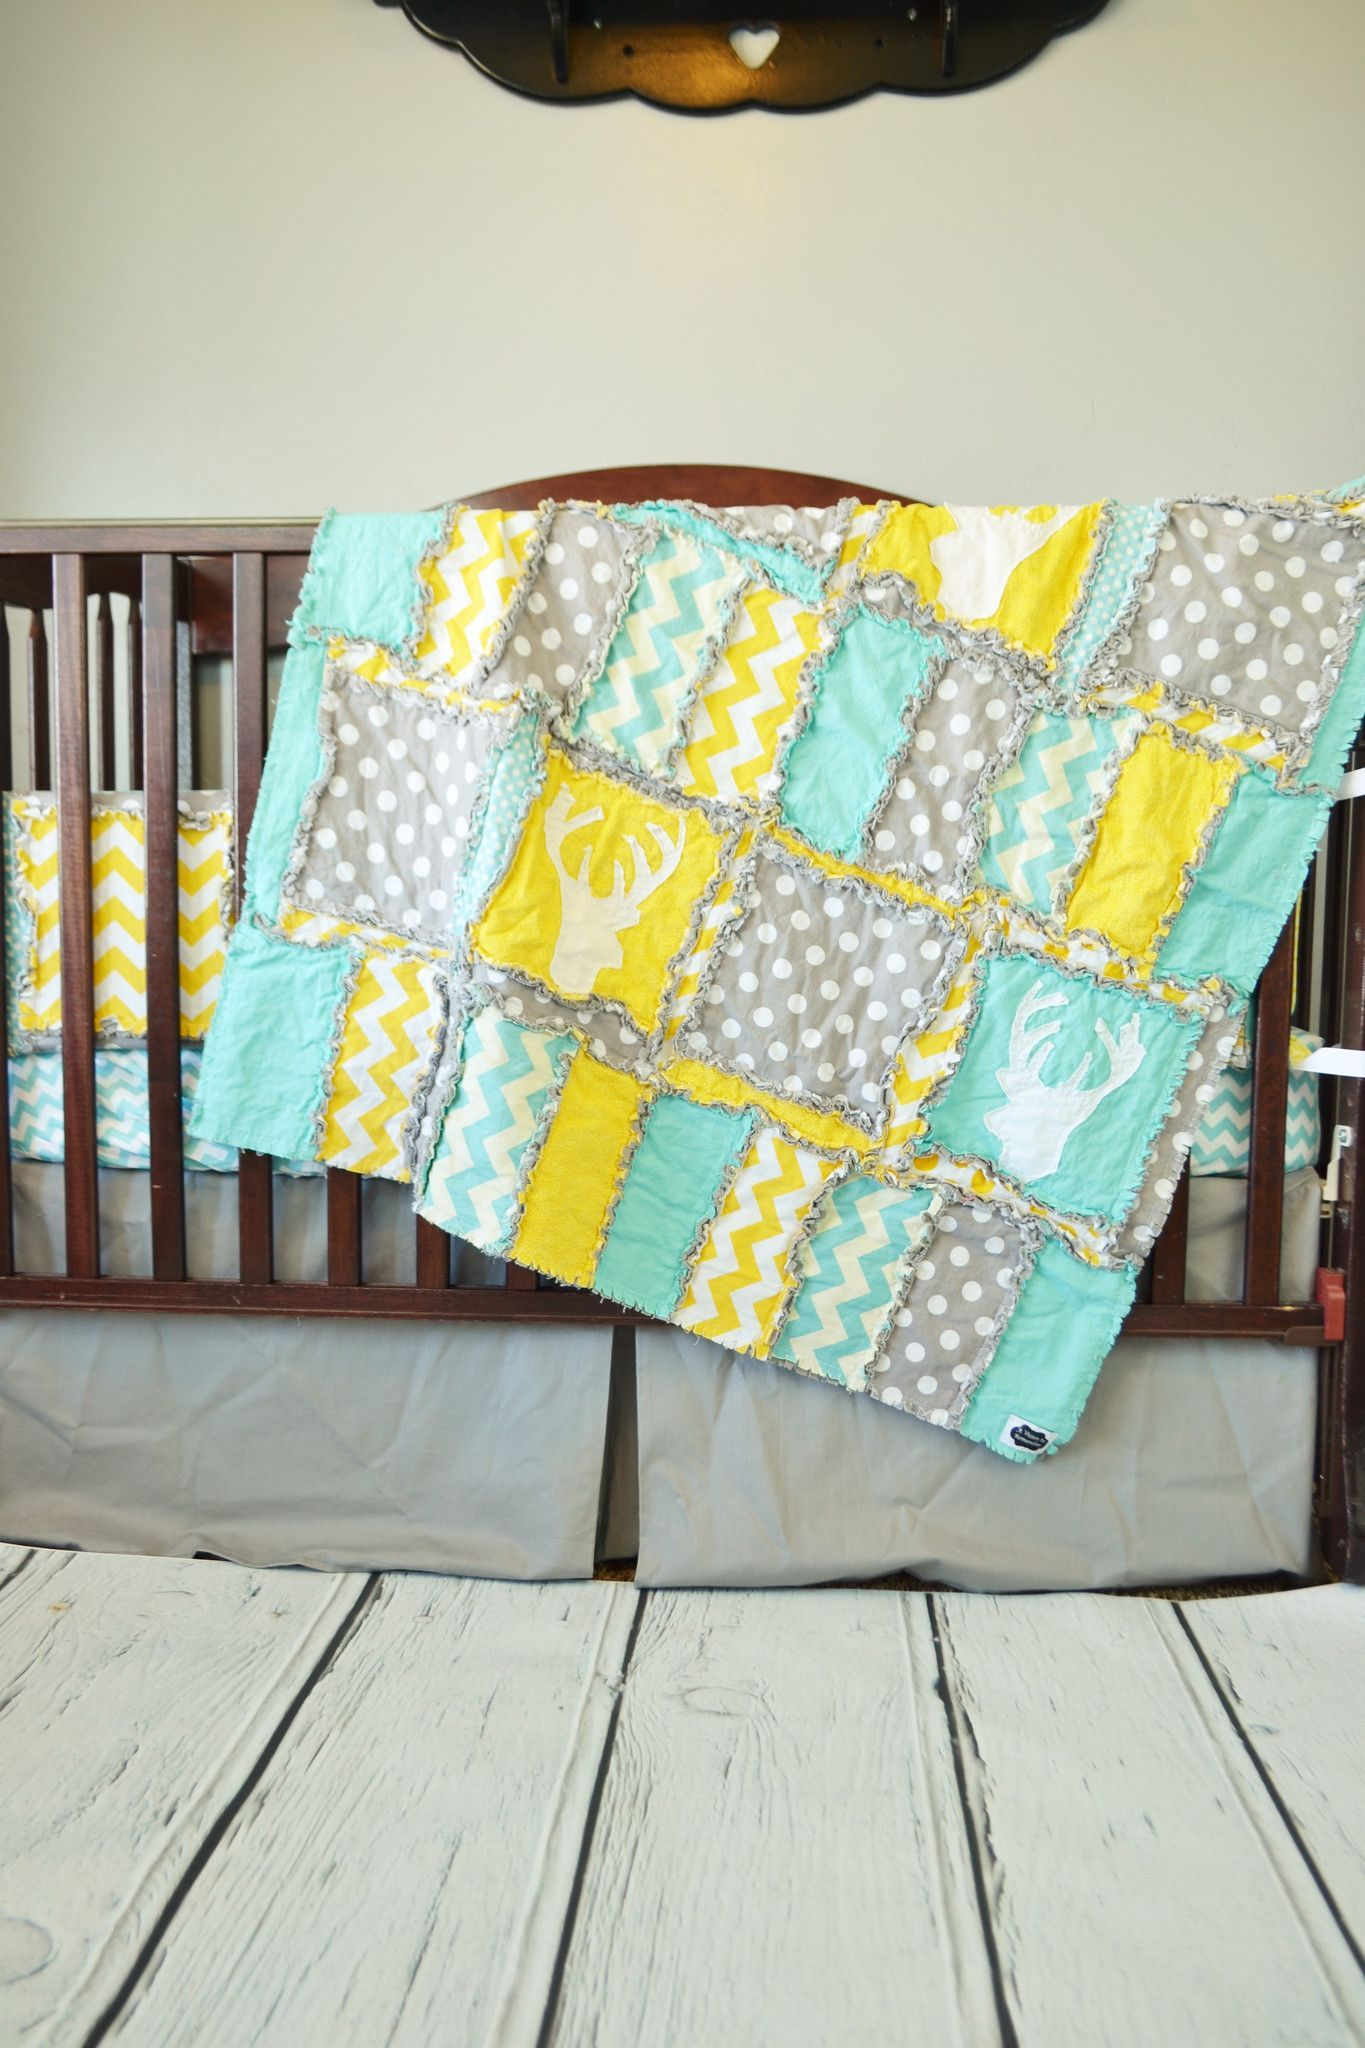 Woodland Baby Crib Bedding for Nursery Deer Theme Yellow